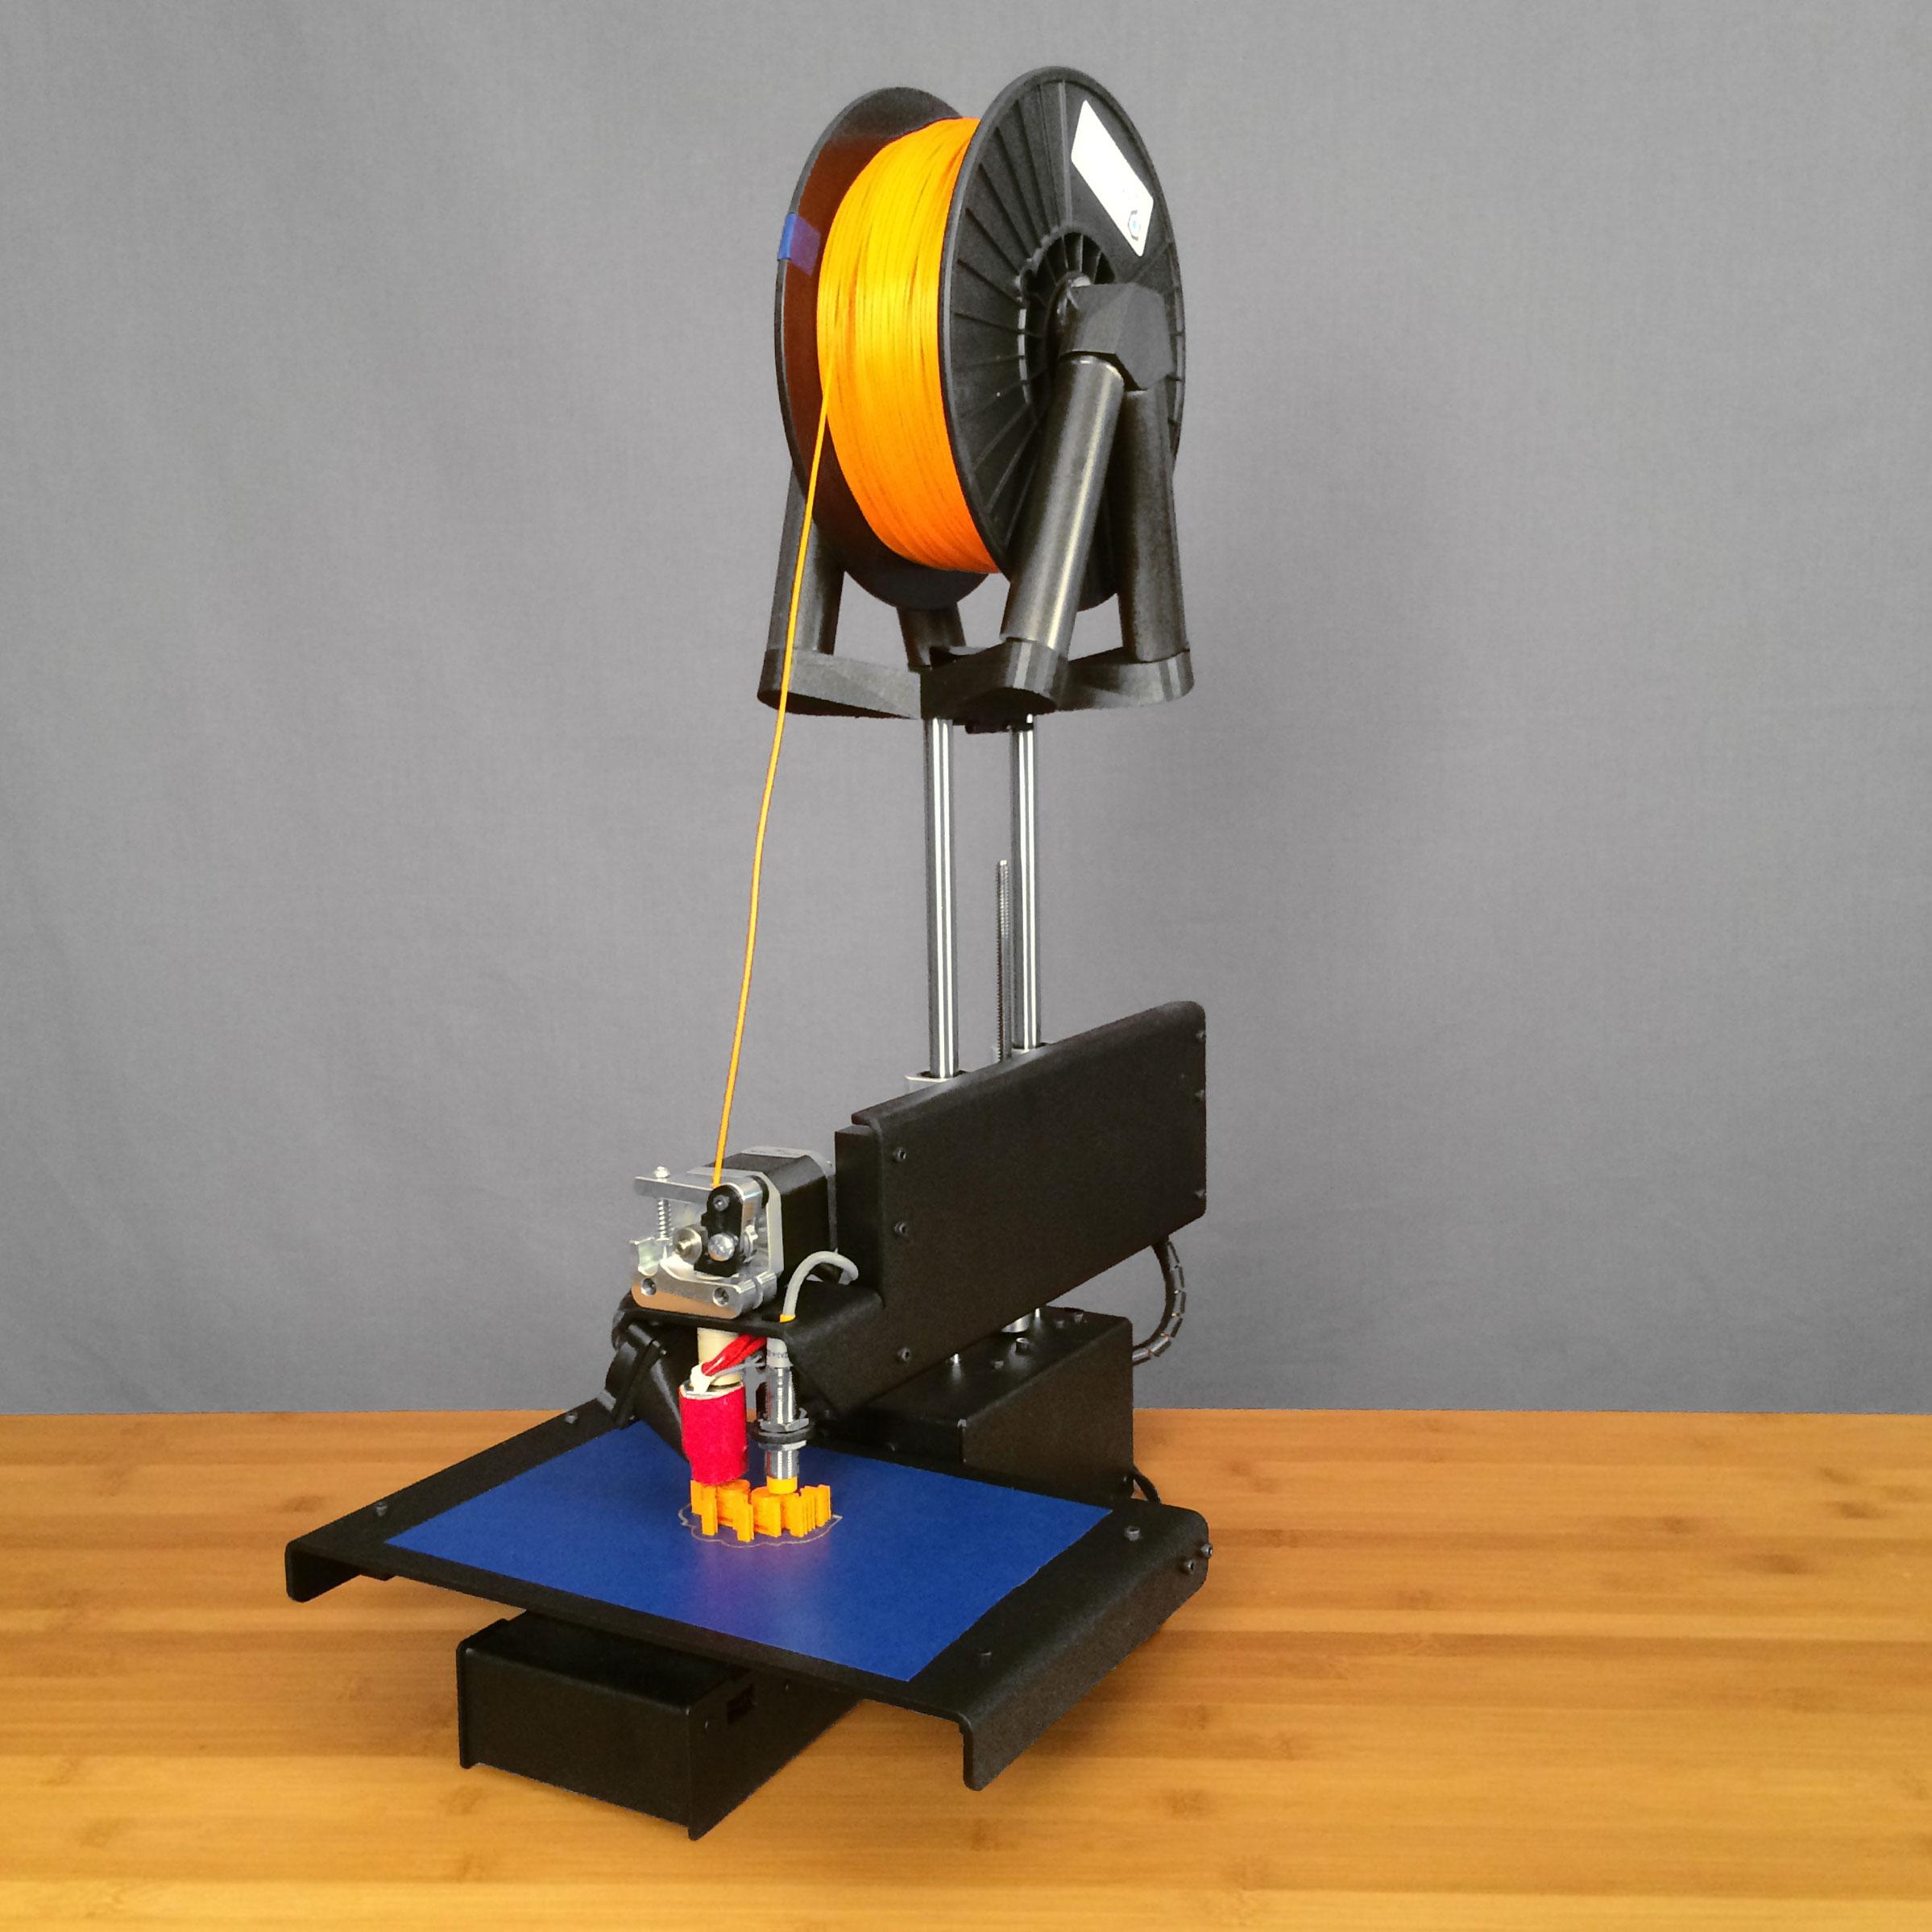 printrbot-spool-holder